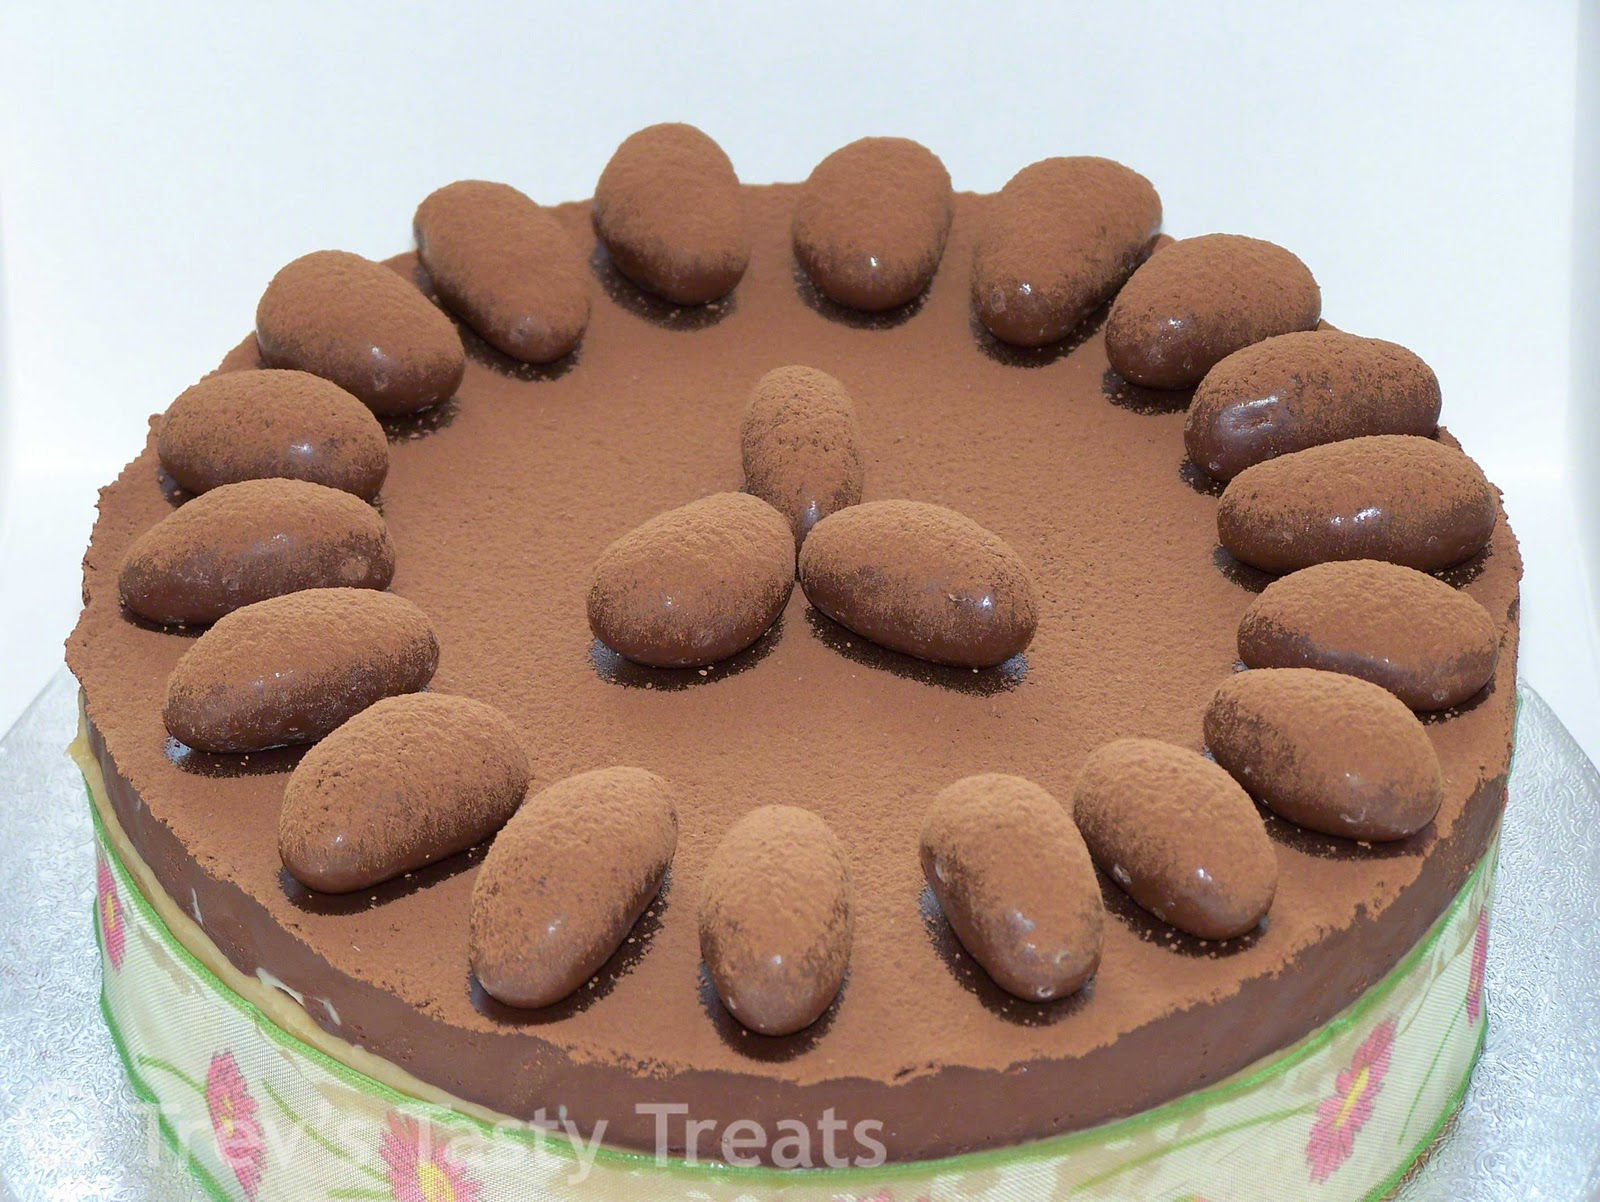 Trev's Tasty Treats: November 2011